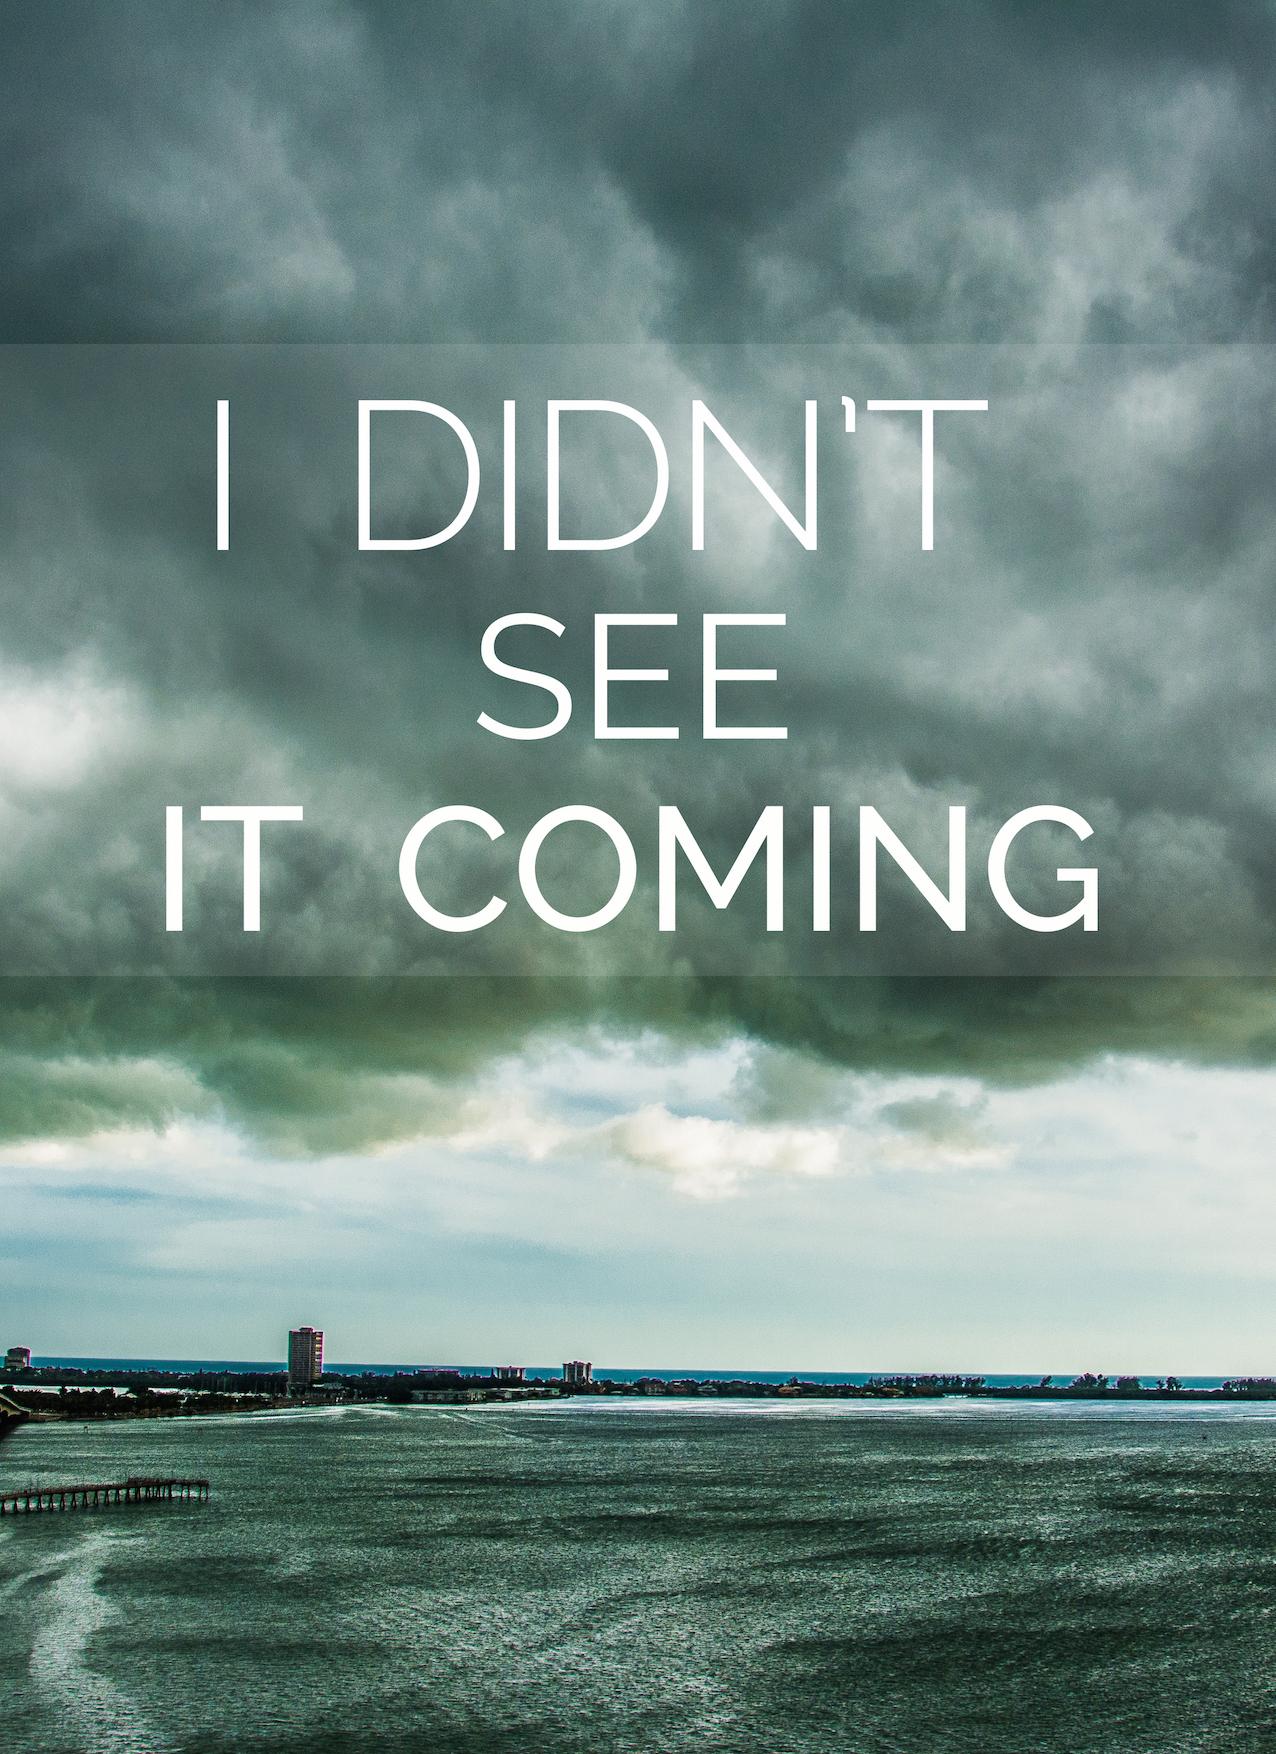 Did not see it coming - Leslie Brown